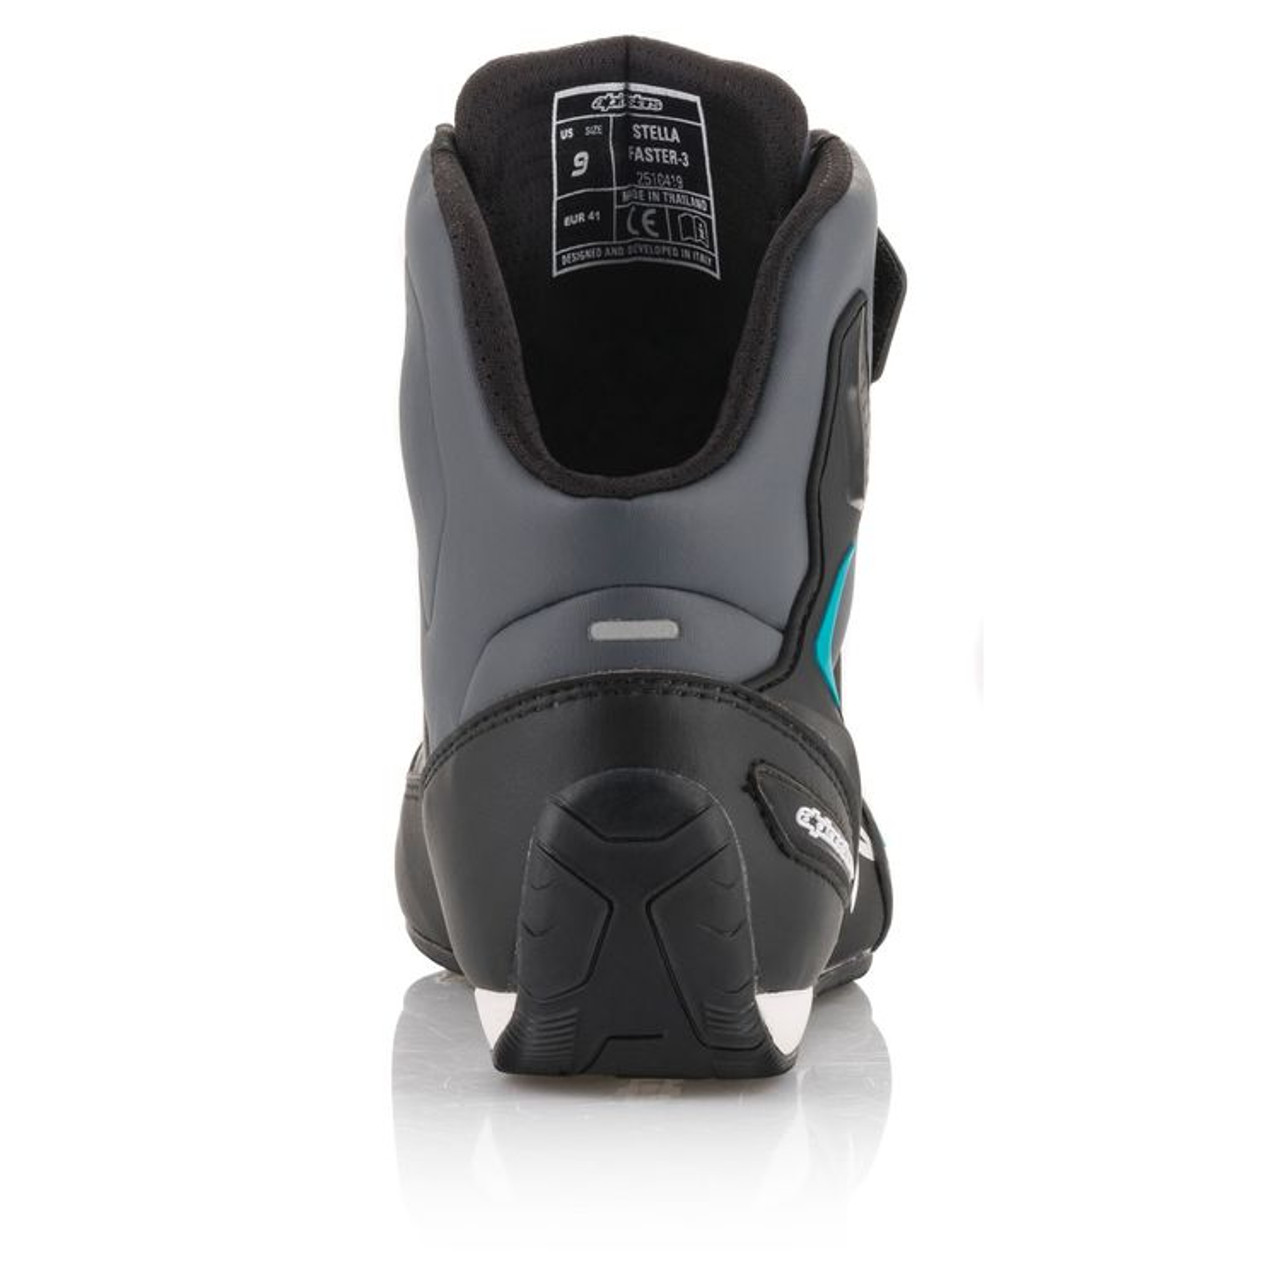 6.5 Black//Silver Alpinestars Women/'s Stella FASTER-3 Street Riding Shoes